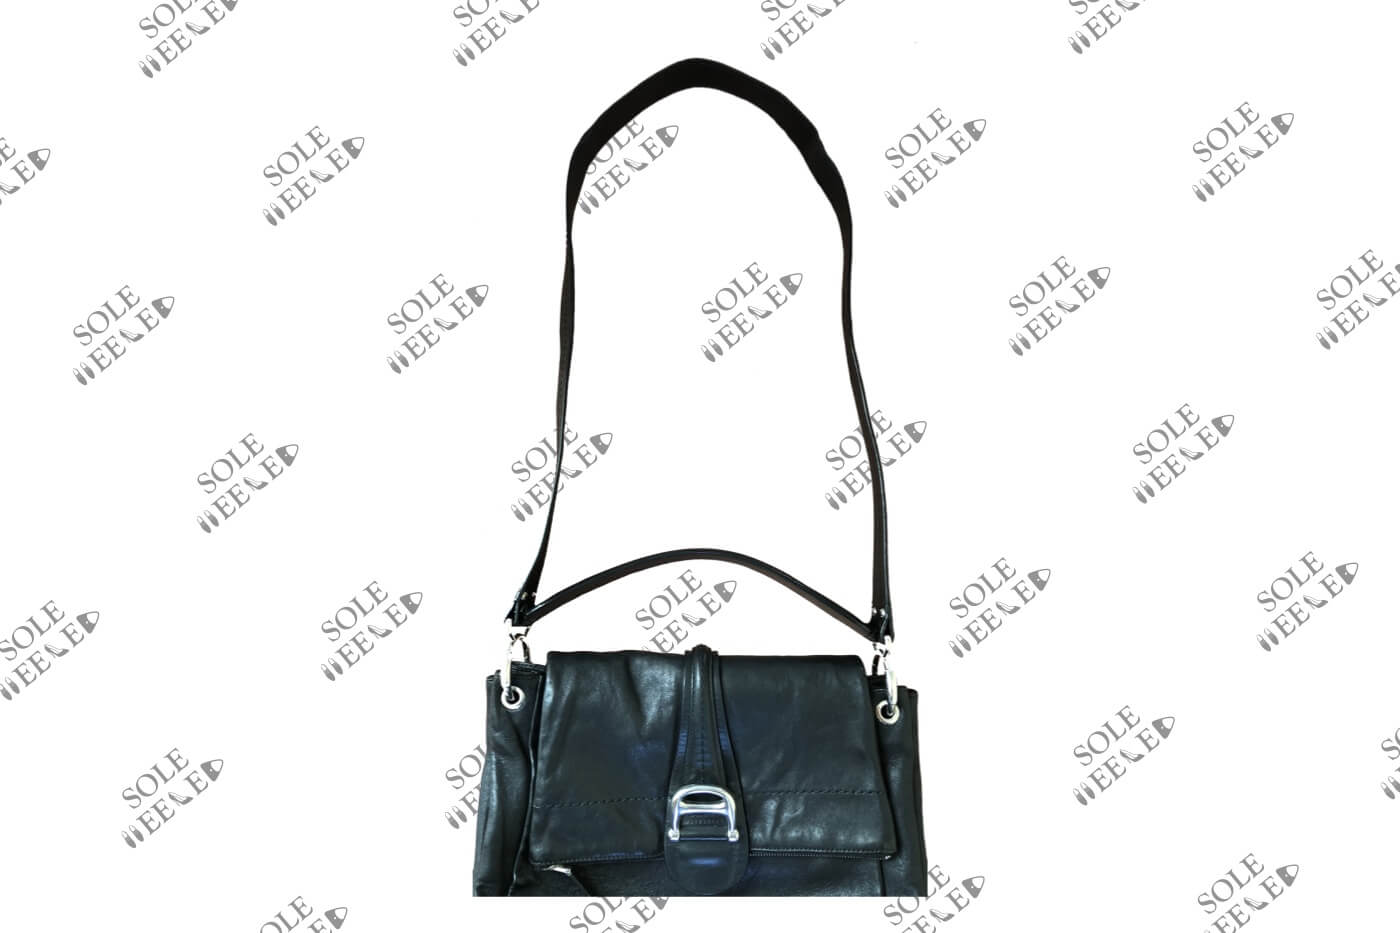 Bally Handbag Strap Extension